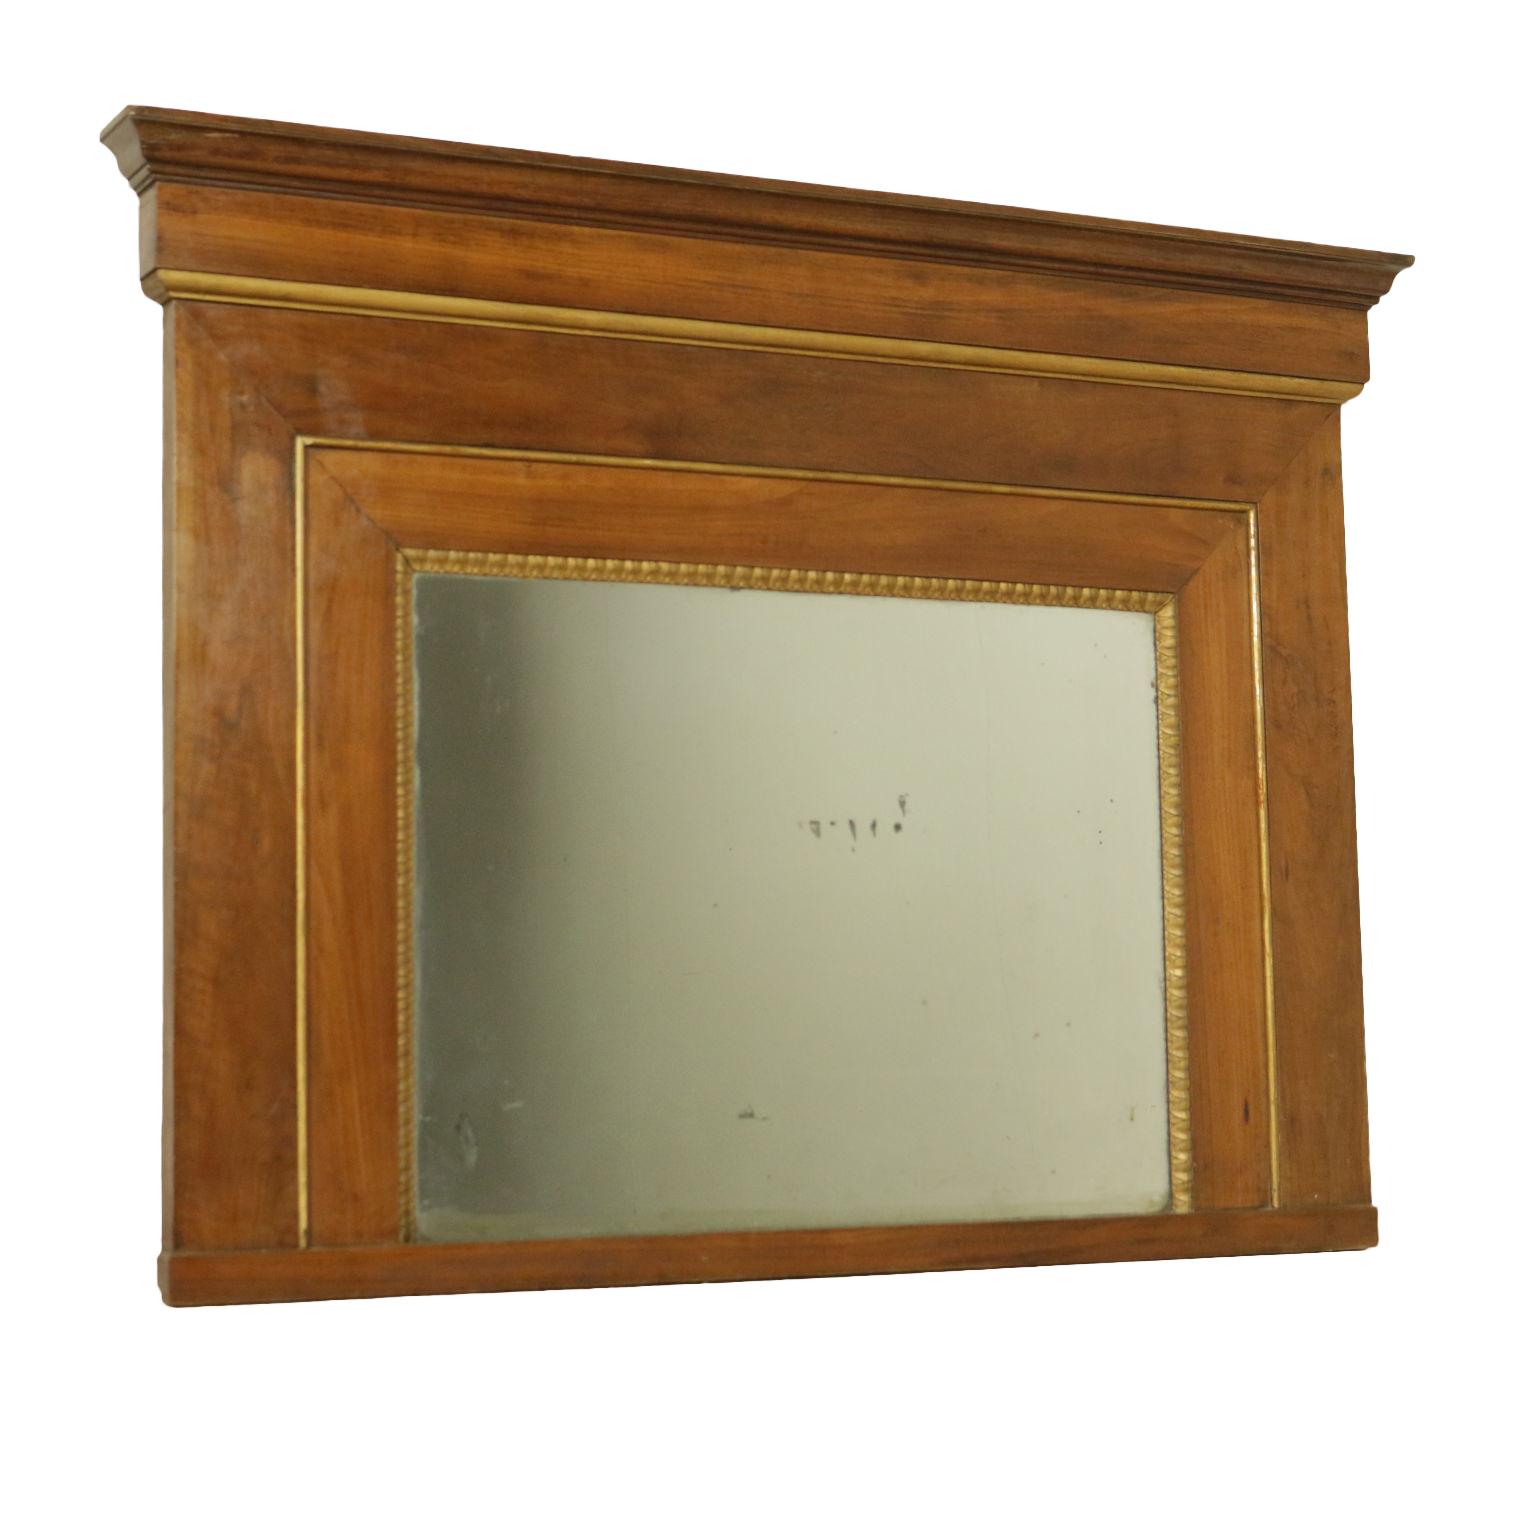 gro e caminiera spiegel und rahmen antiquit ten. Black Bedroom Furniture Sets. Home Design Ideas